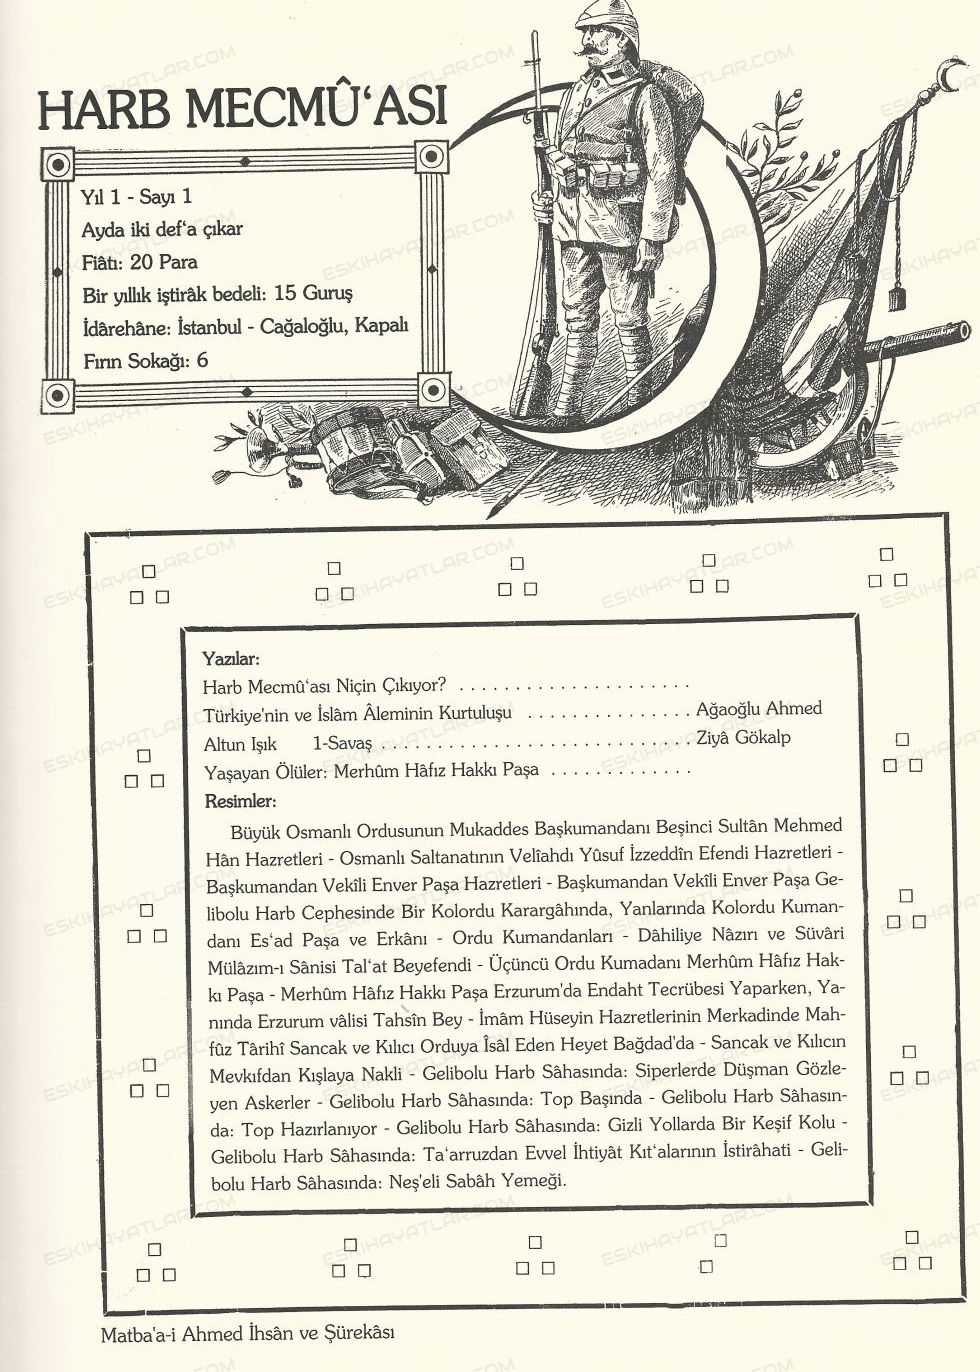 0490-harb-mecmuasi-kasim-1915-haziran-1918-turk-tarih-vakfi (3)